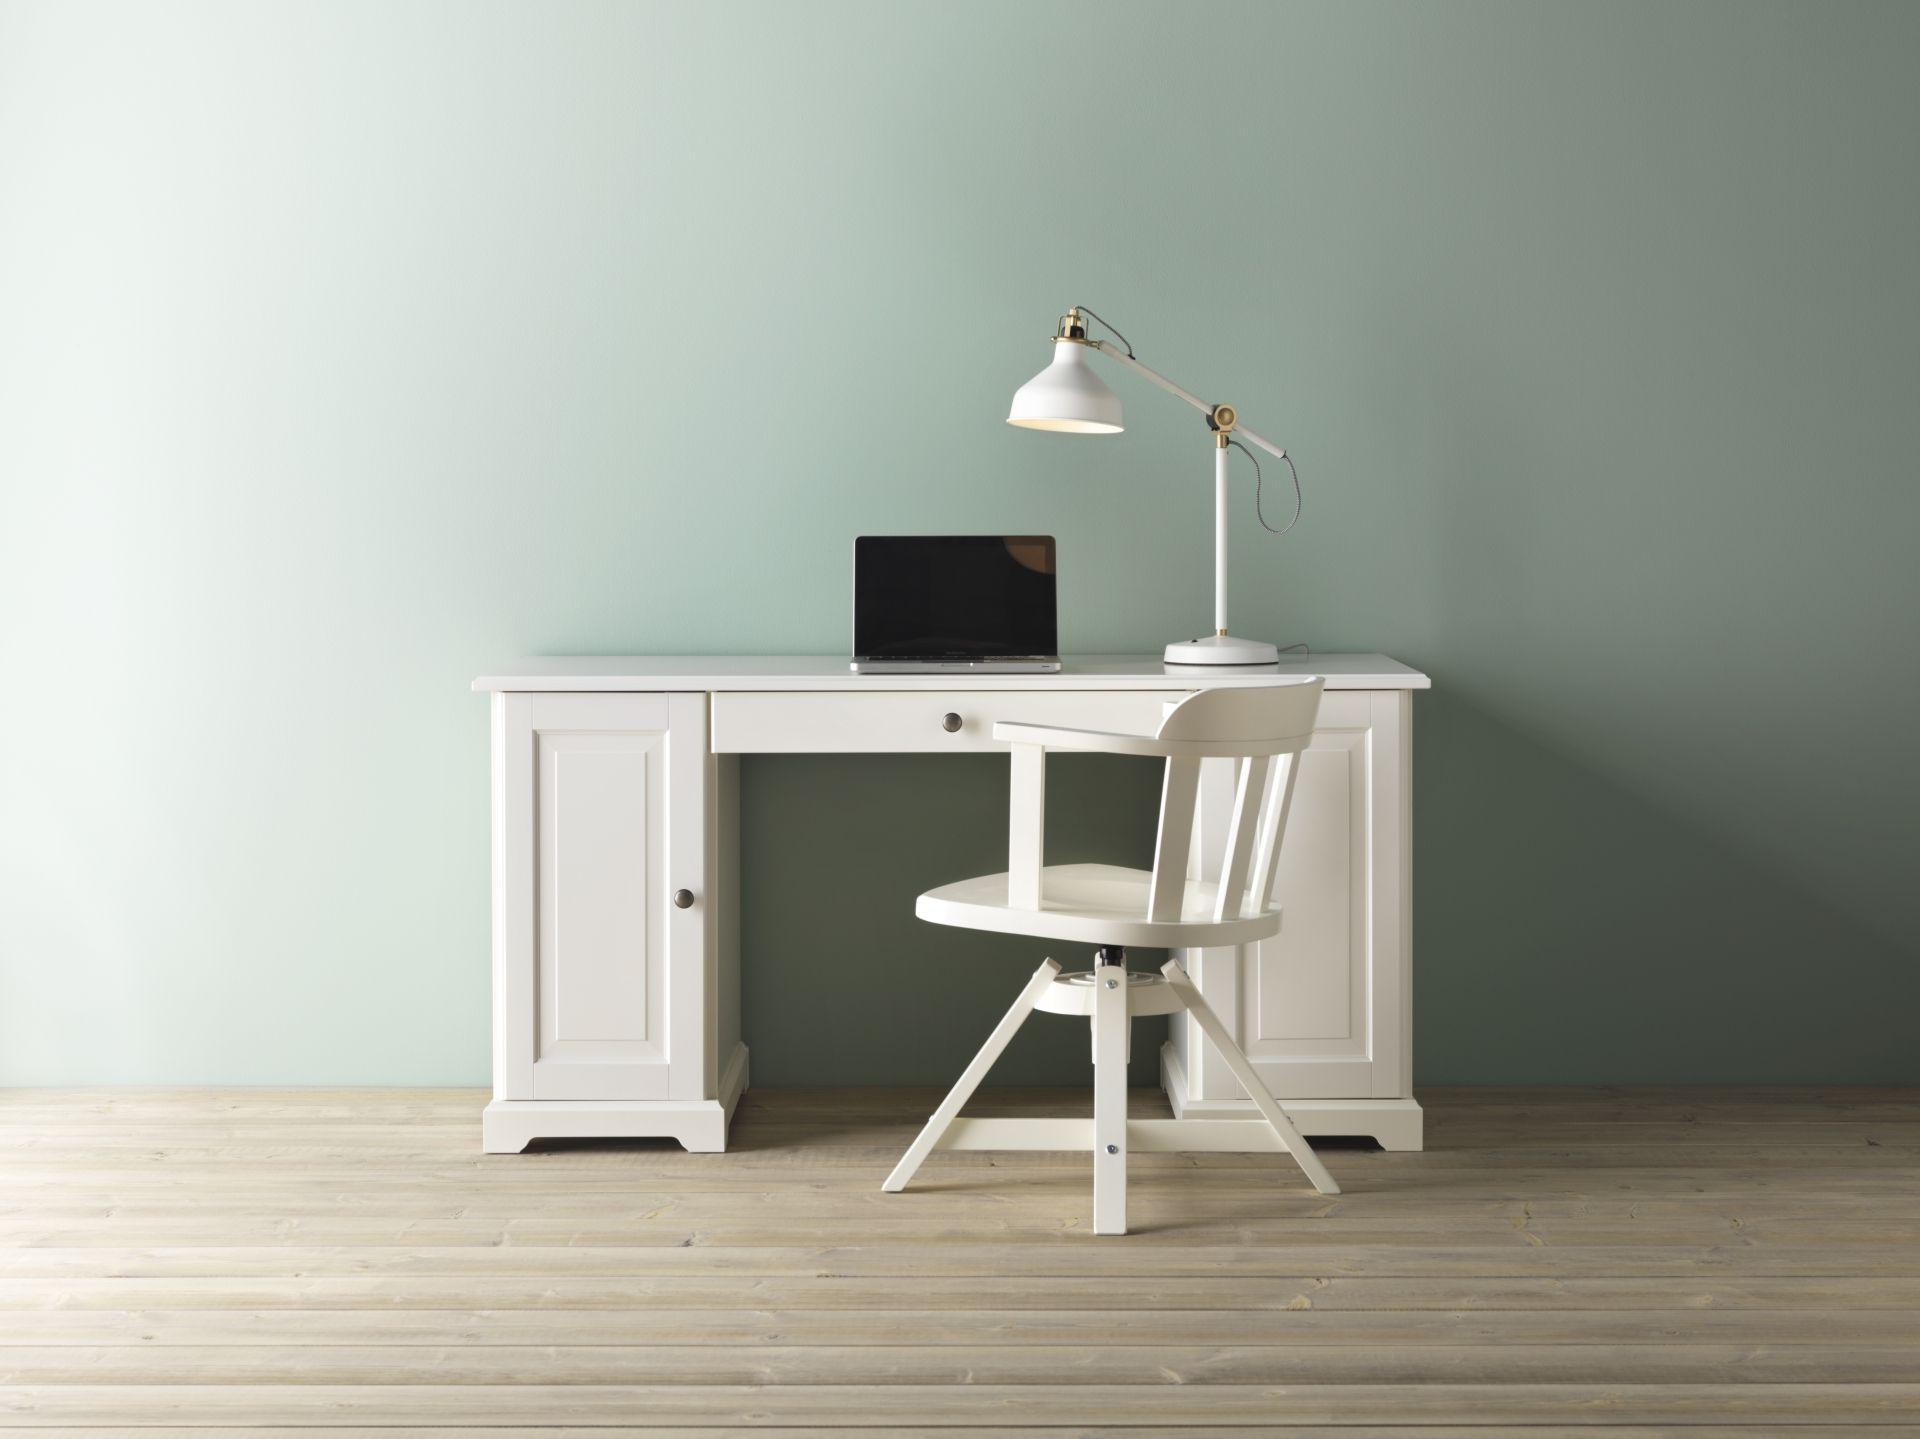 Ikea Stoel Wit : Ikea stoel wit great finest cool beautiful noordkust meubilair